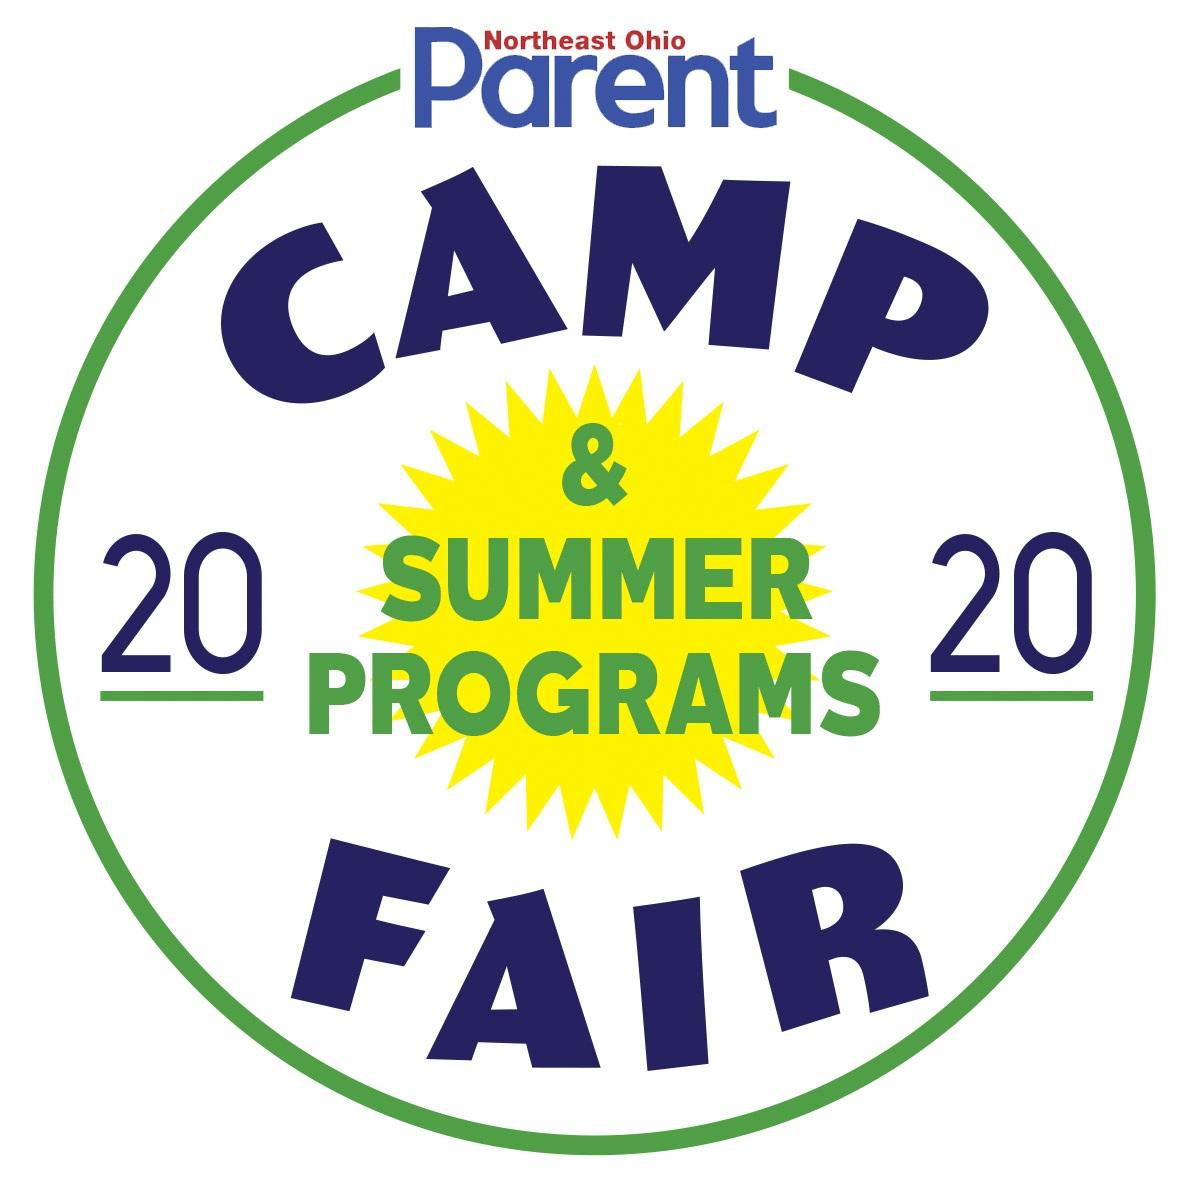 Summer camp and programs fair